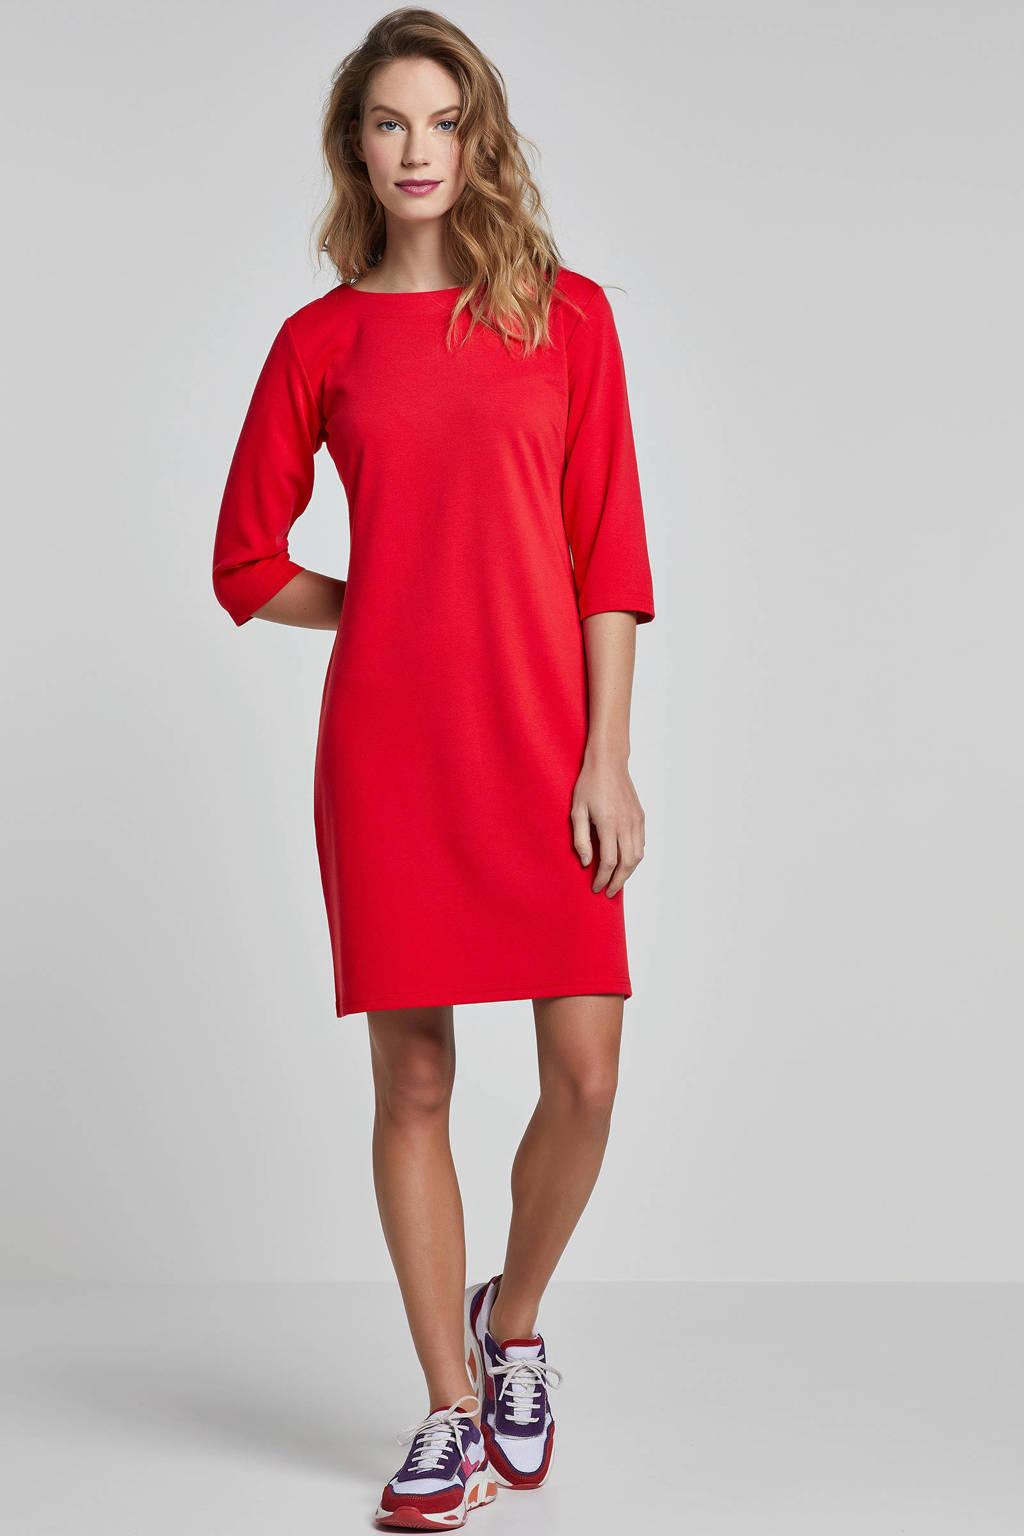 FREEQUENT jurk rood, Rood